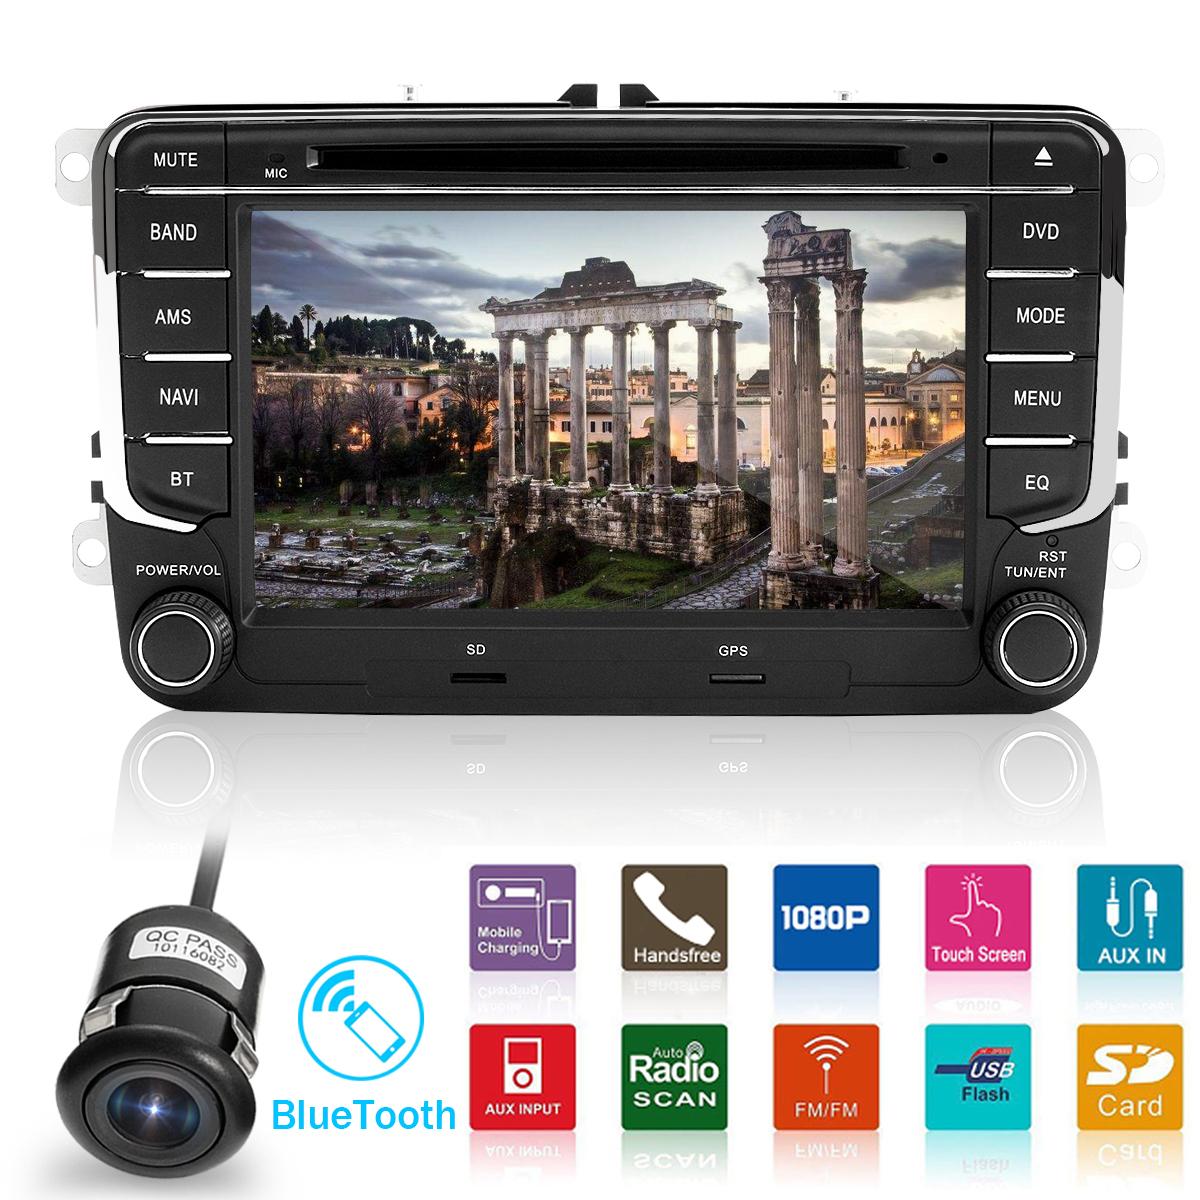 "Double Din 7"" Car Stereo Radio DVD Sat Nav GPS bluetooth For VW Golf MK5 MK6 Jetta Passat CD Player/DVD Player/MP3 Player/USB/microSD Ports"